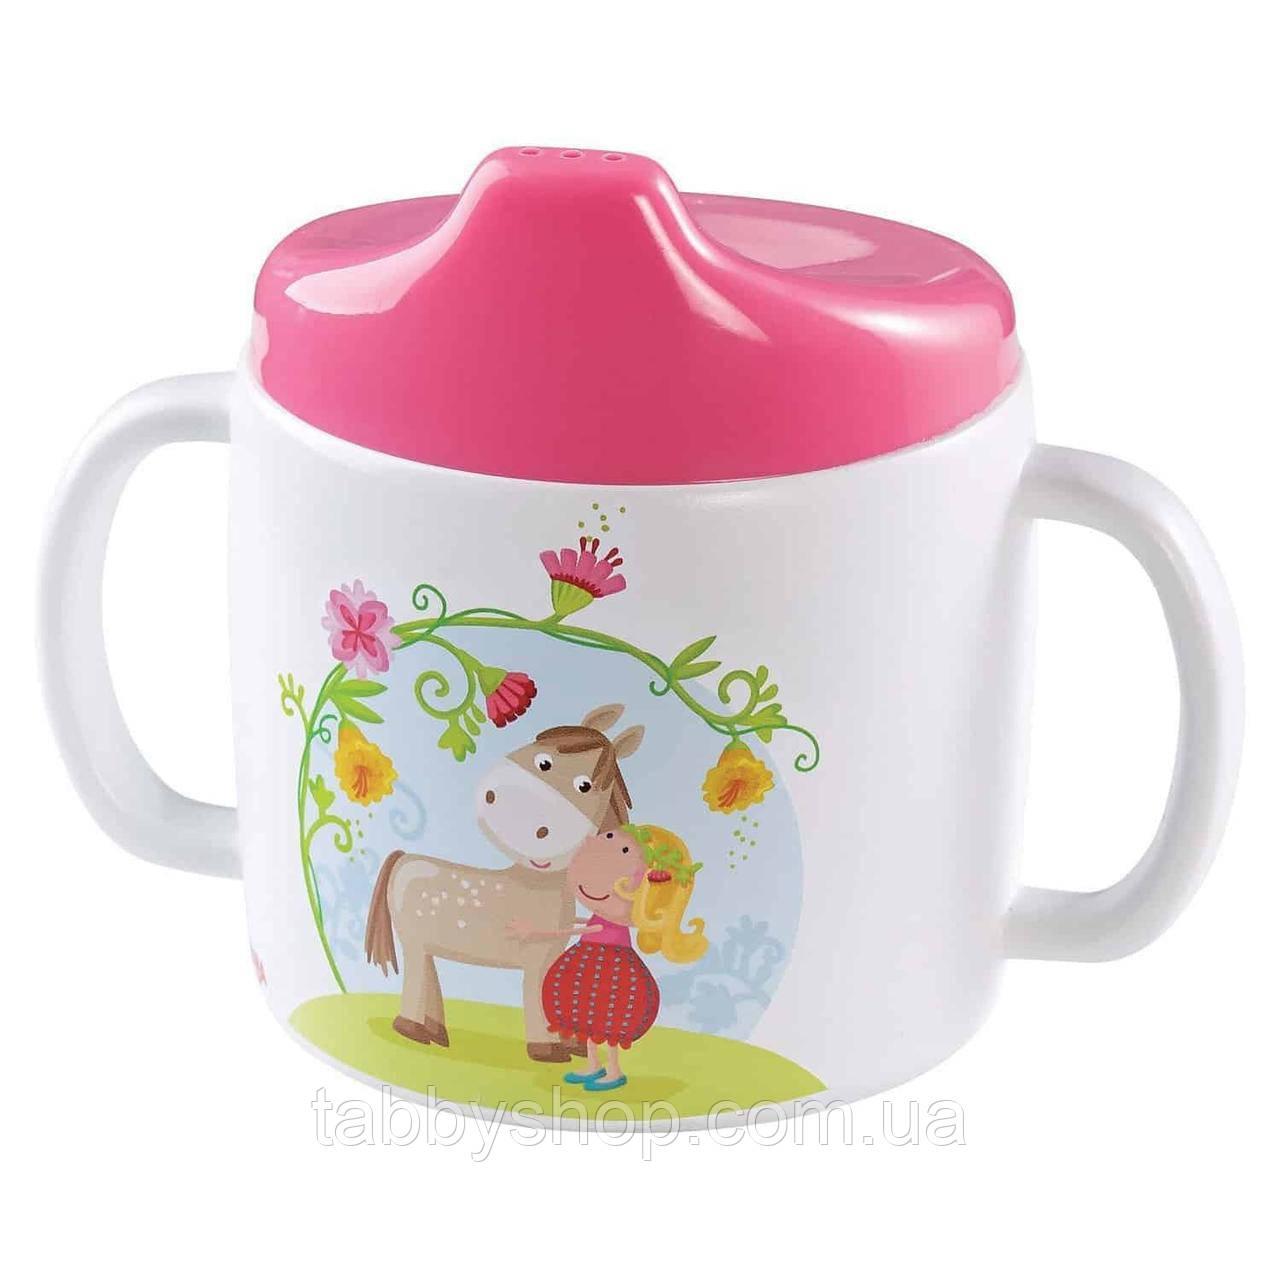 "Чашка-непроливайка HABA ""Мой пони"""